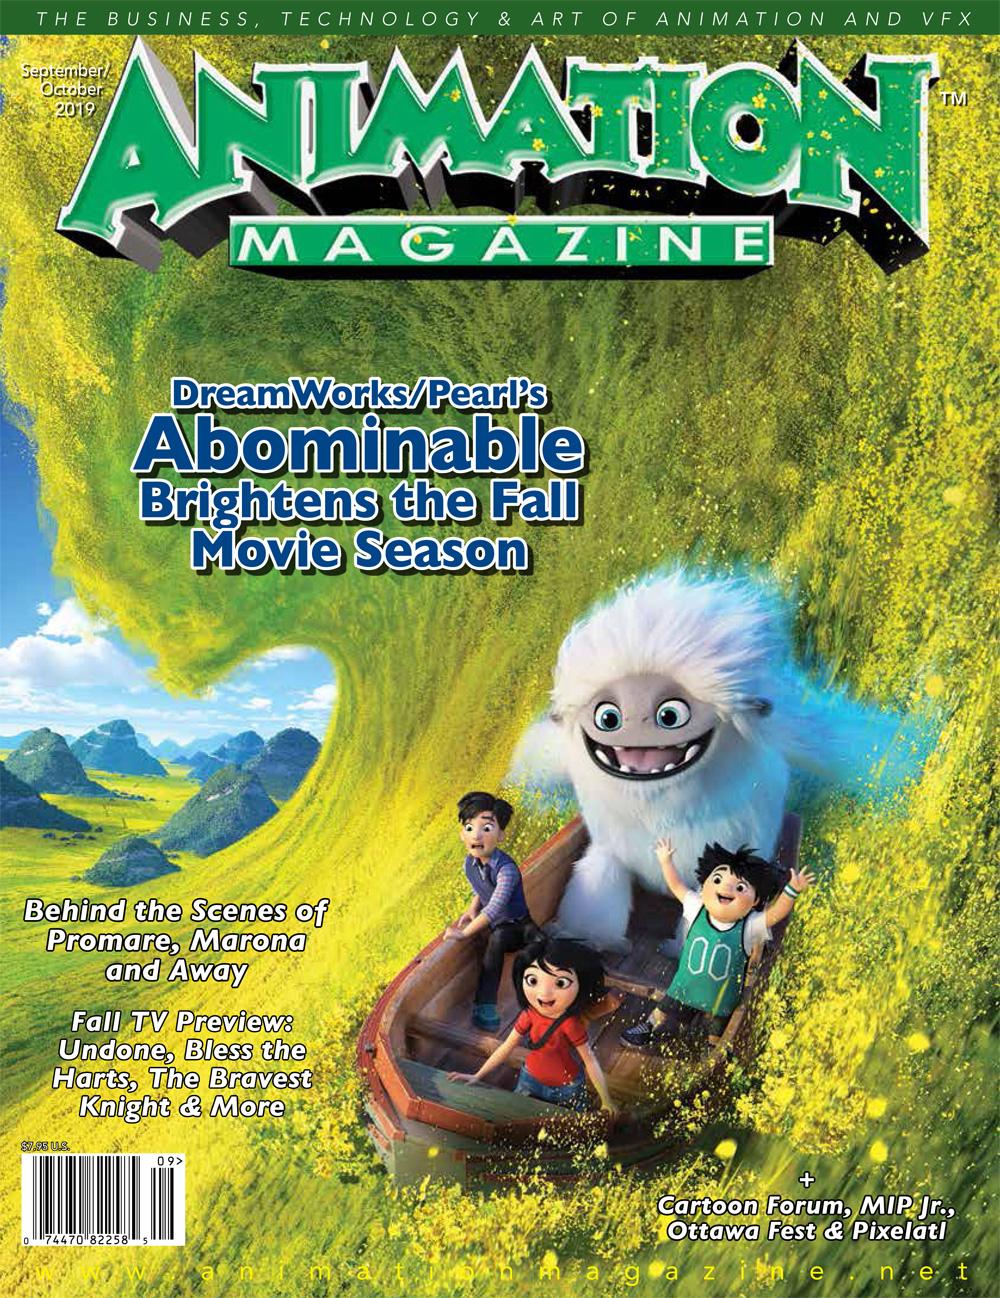 Animation Magazine - #293 September/October 2019